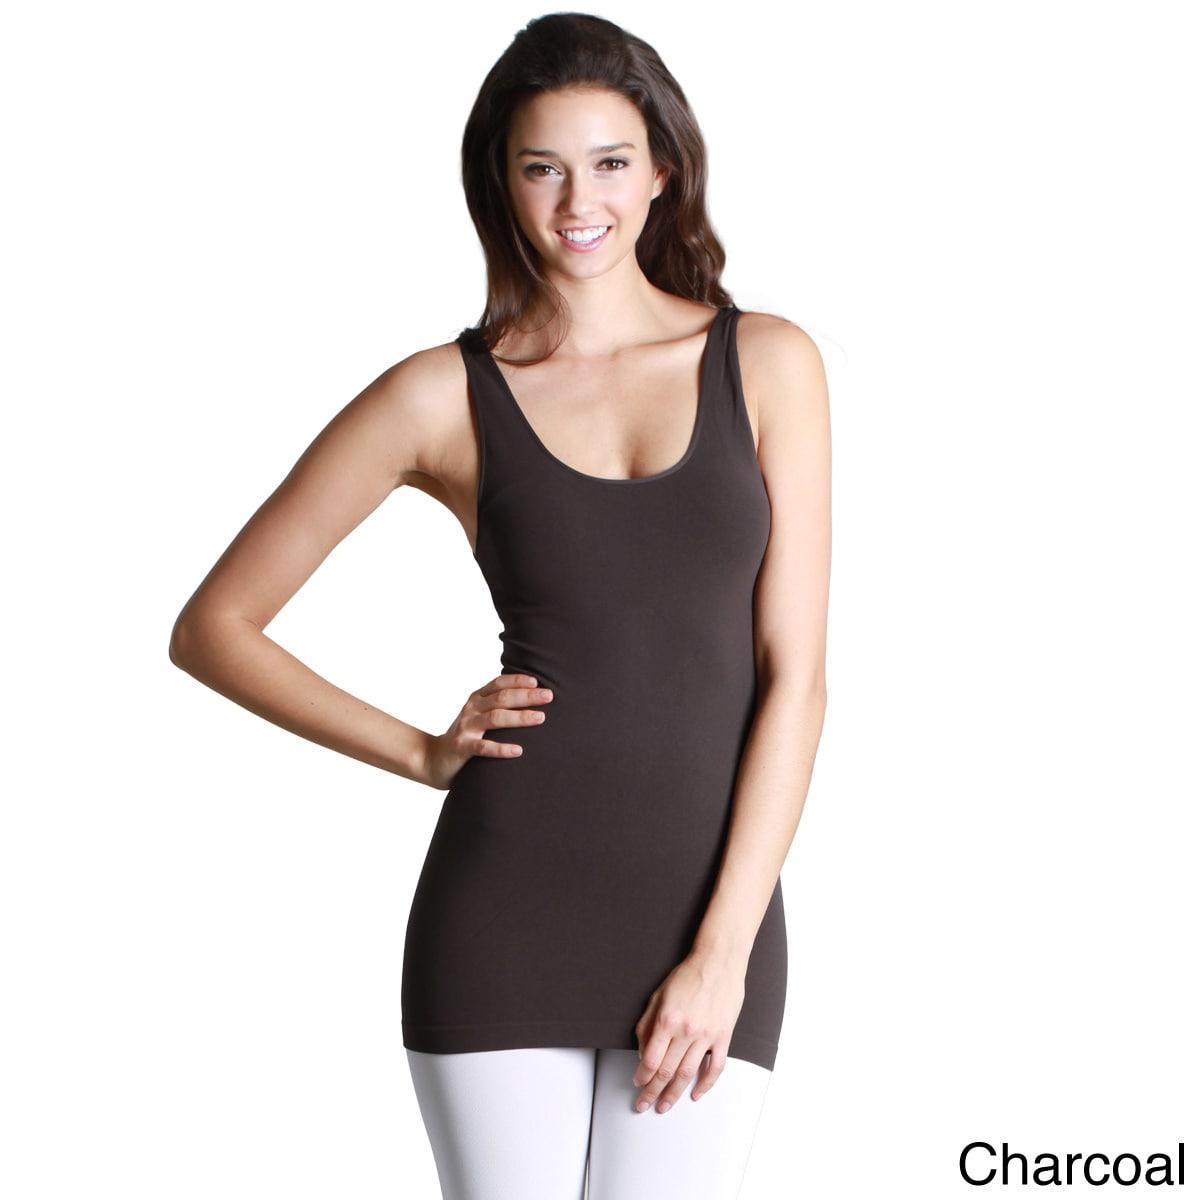 e9d86e23065672 Shop NikiBiki Women s Seamless Basic Solid Nylon Spandex Jersey Tank Top -  Free Shipping On Orders Over  45 - Overstock - 10187588